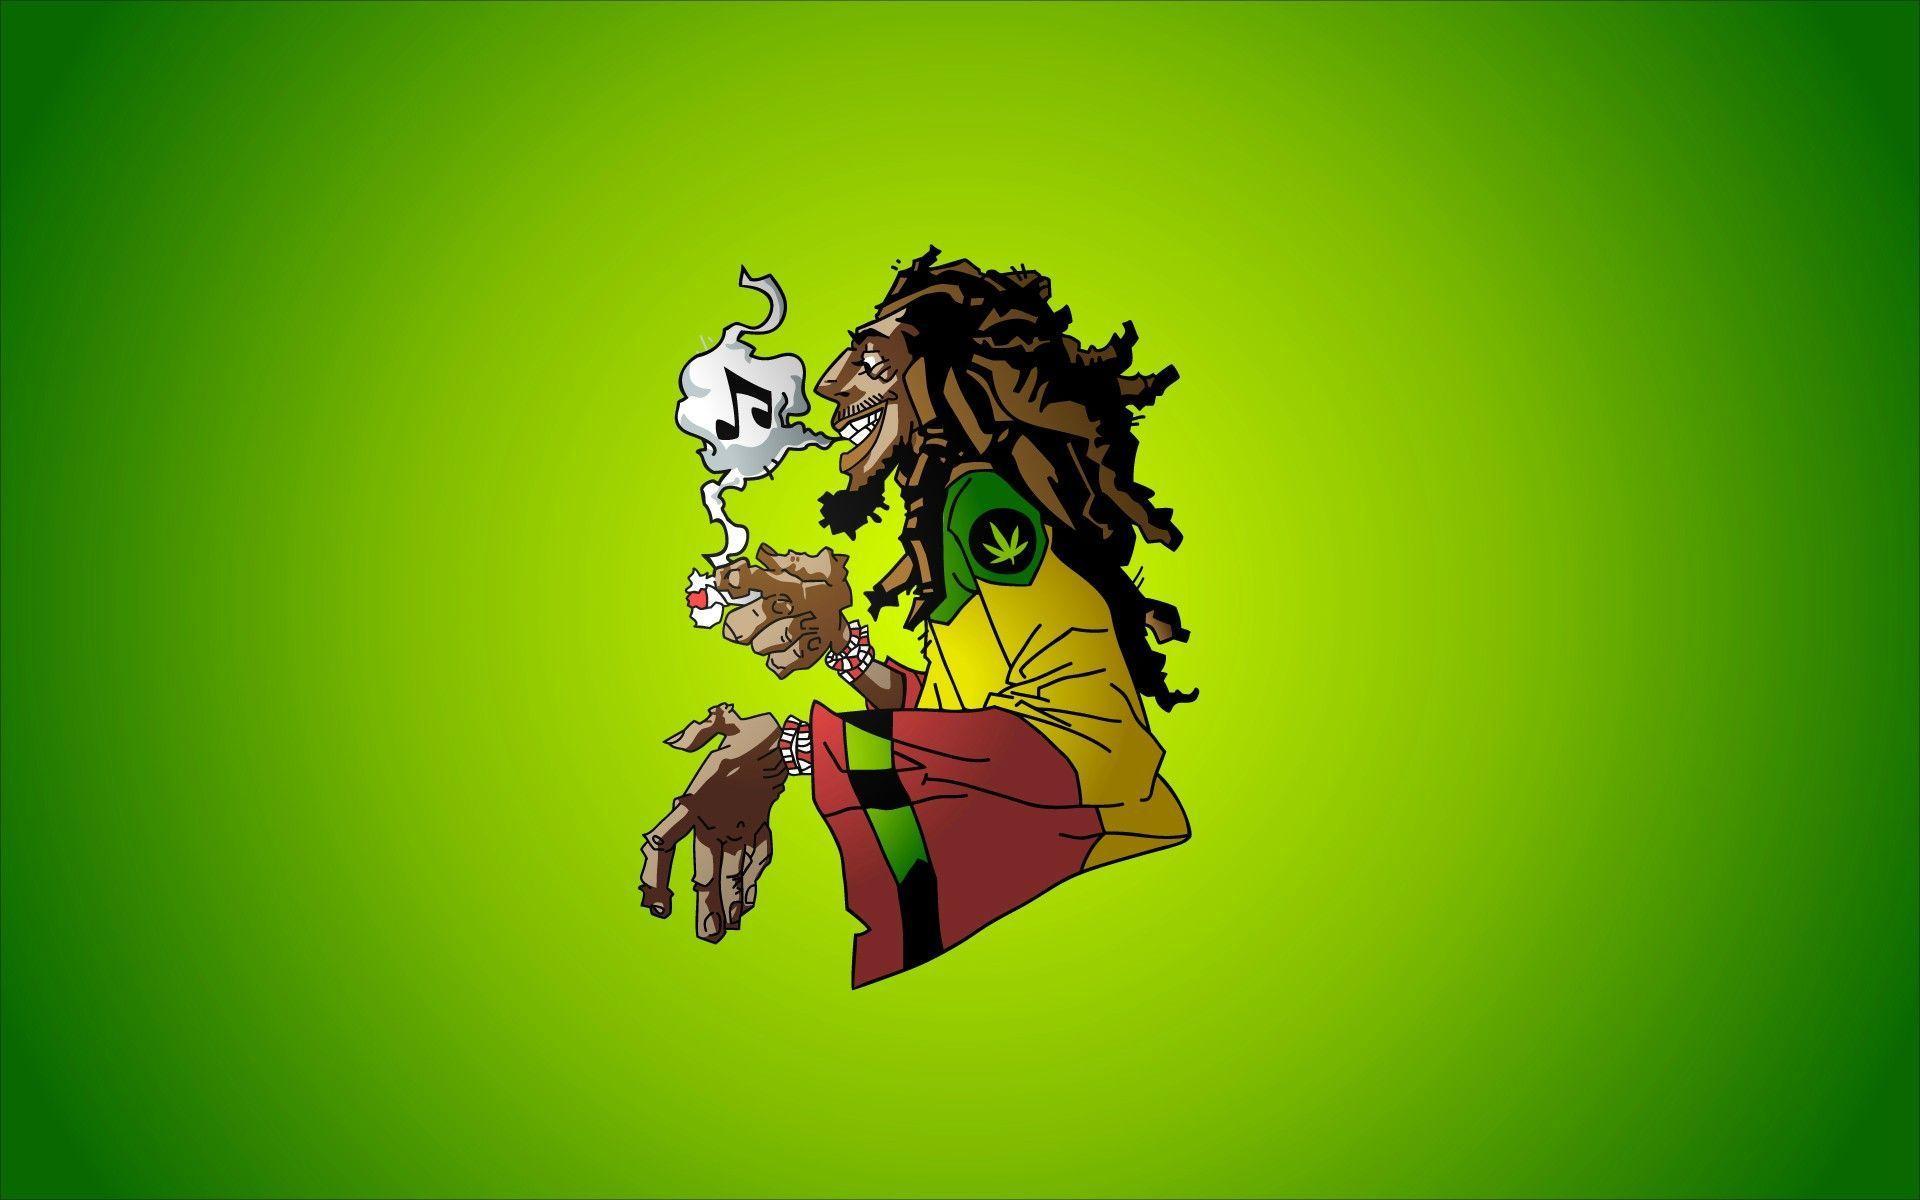 Smoking Weed Wallpapers Top Free Smoking Weed Backgrounds